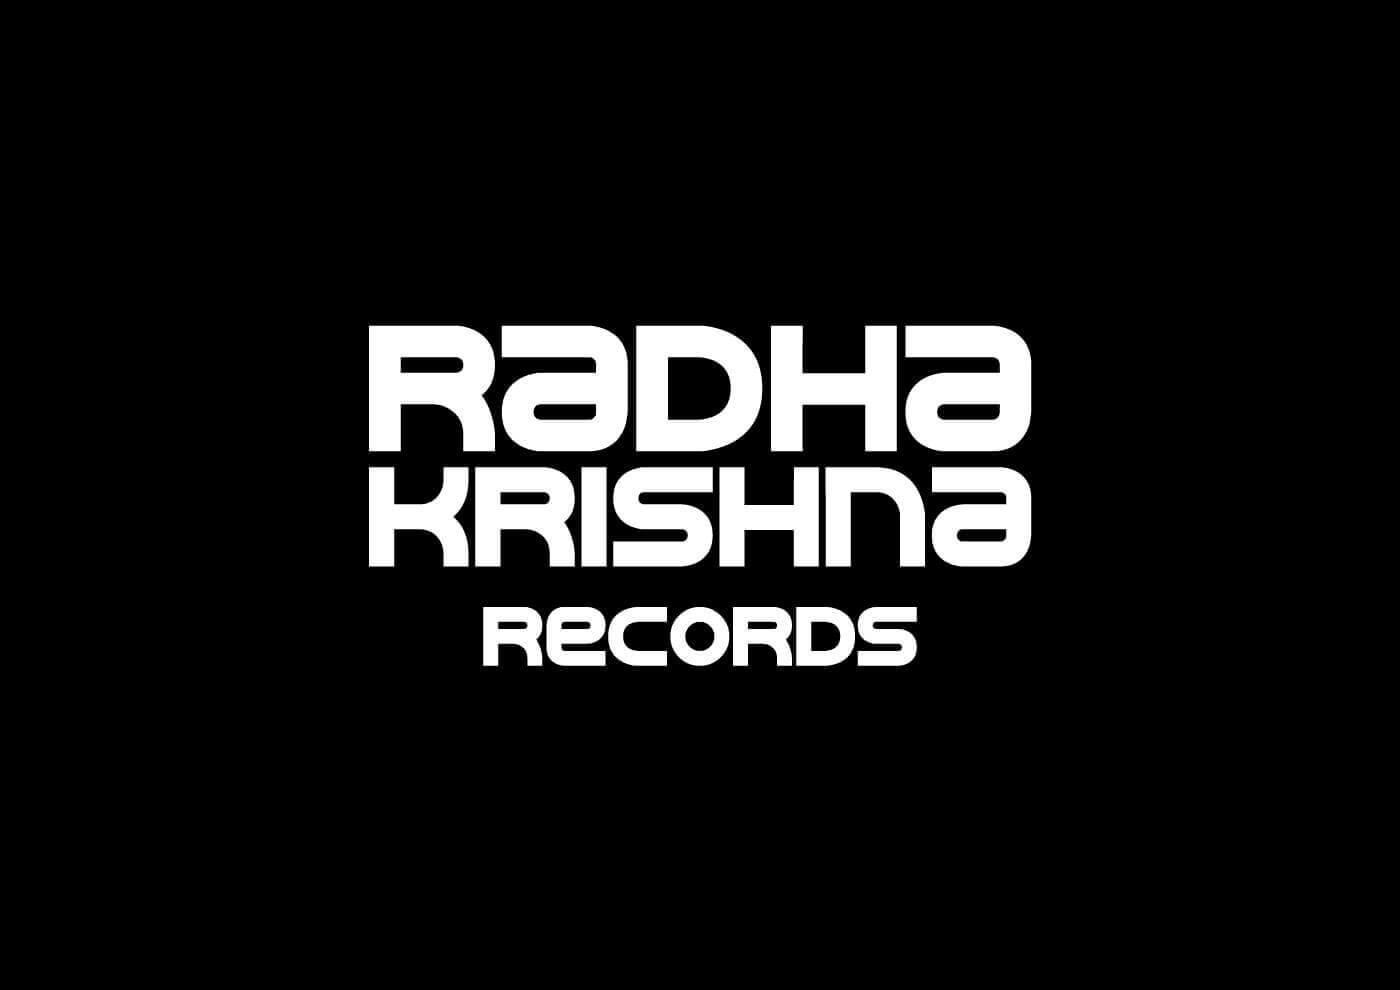 Radha Krishna Records - Logotype white on black